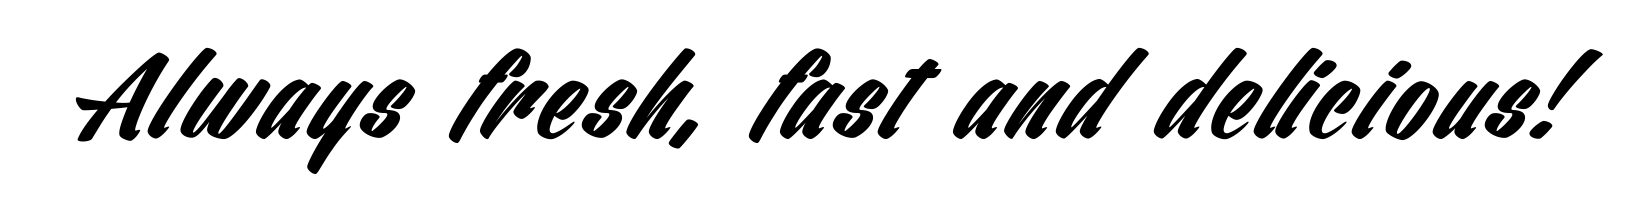 Slogan02